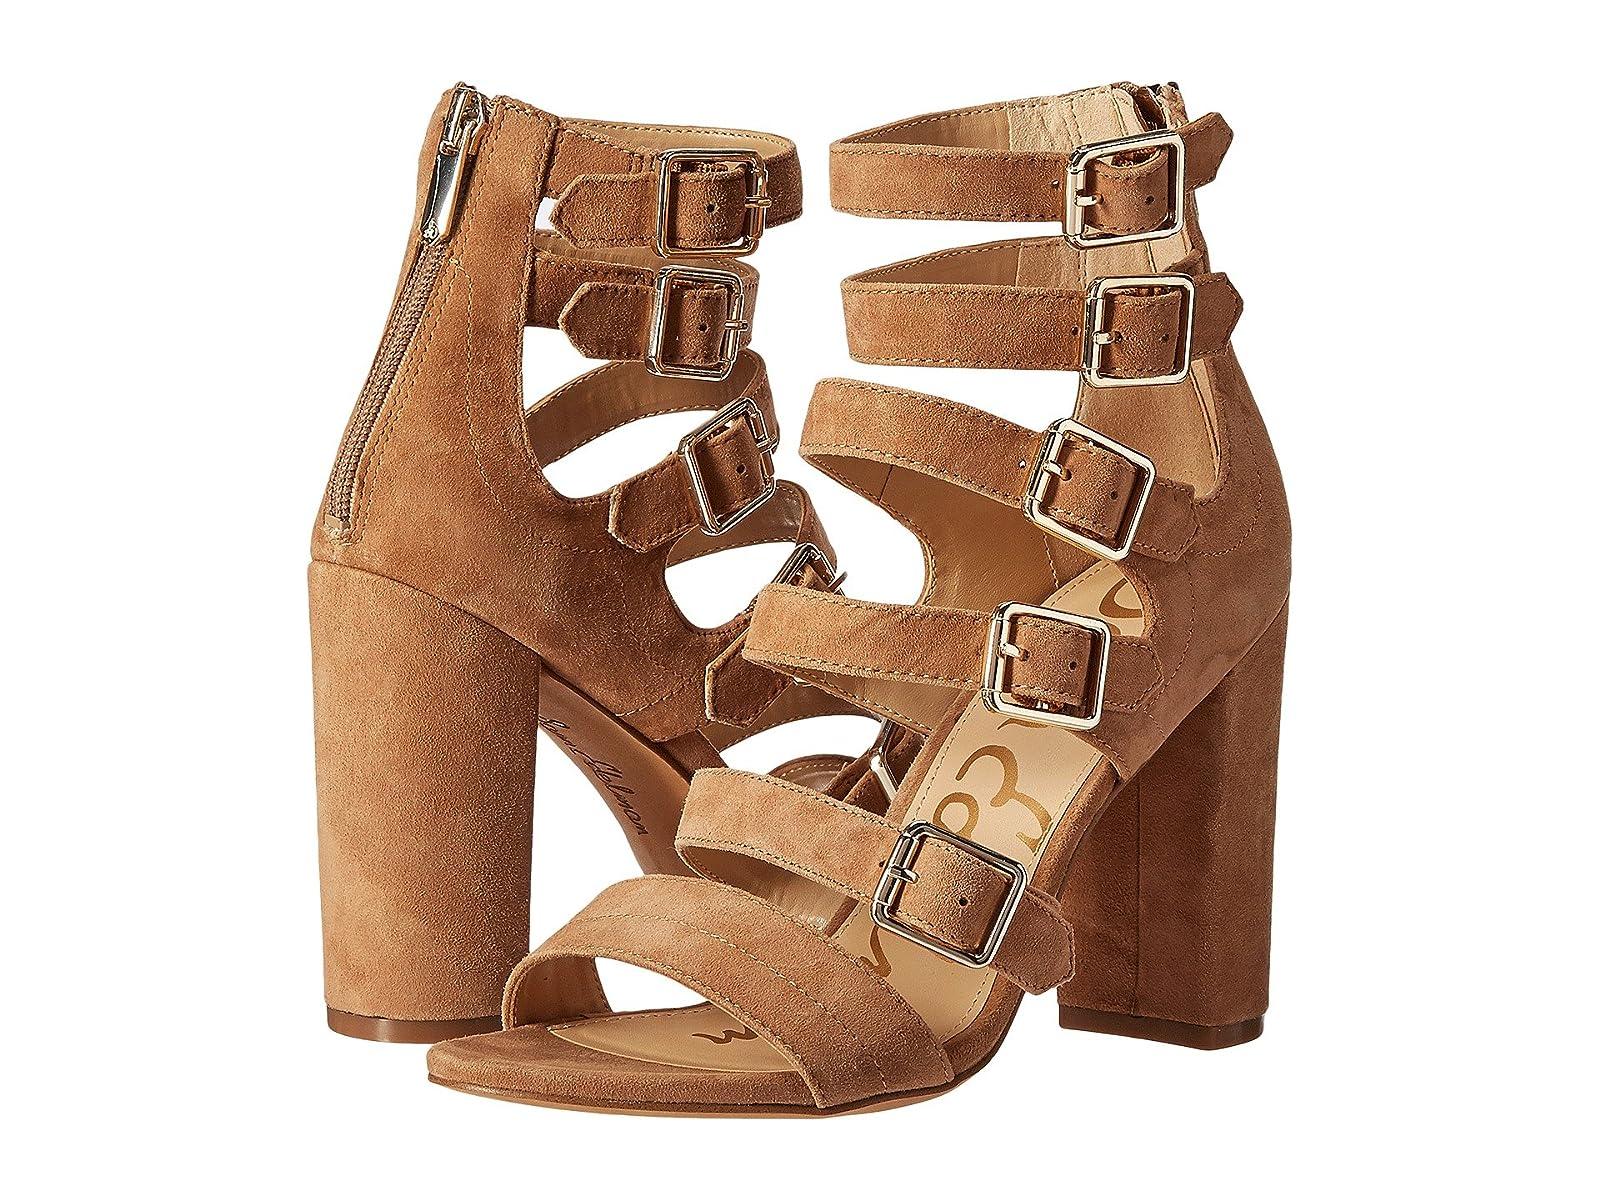 Sam Edelman YasminaCheap and distinctive eye-catching shoes